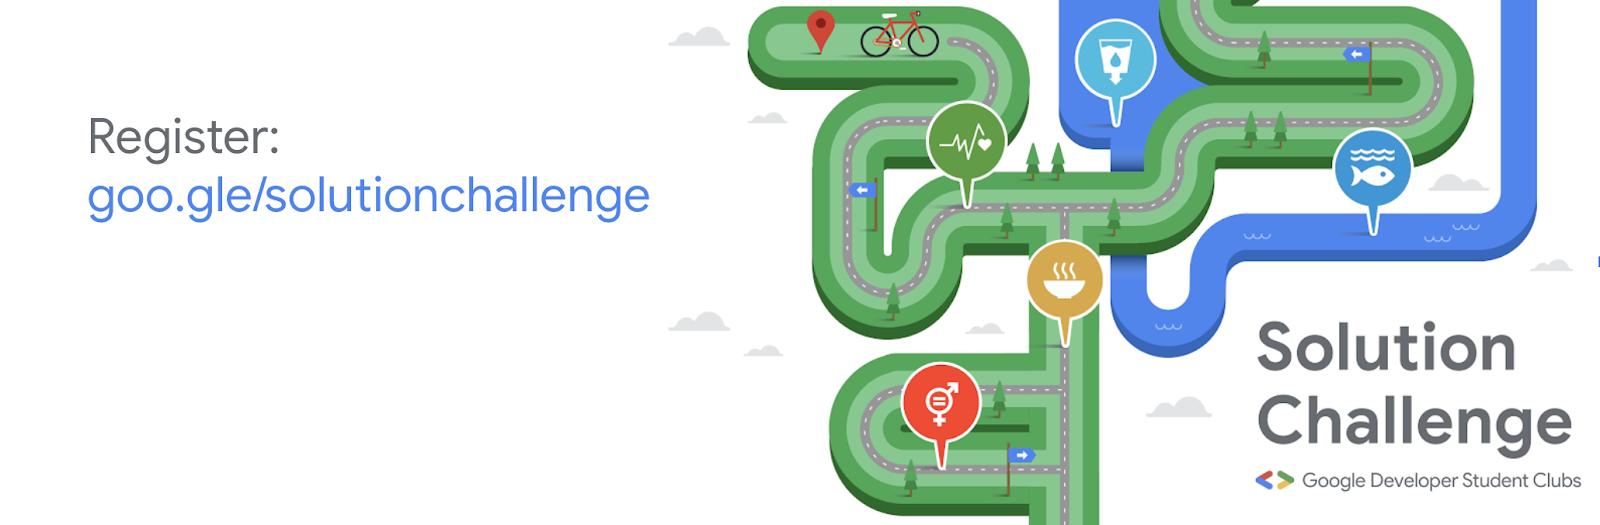 Solution Challenge image